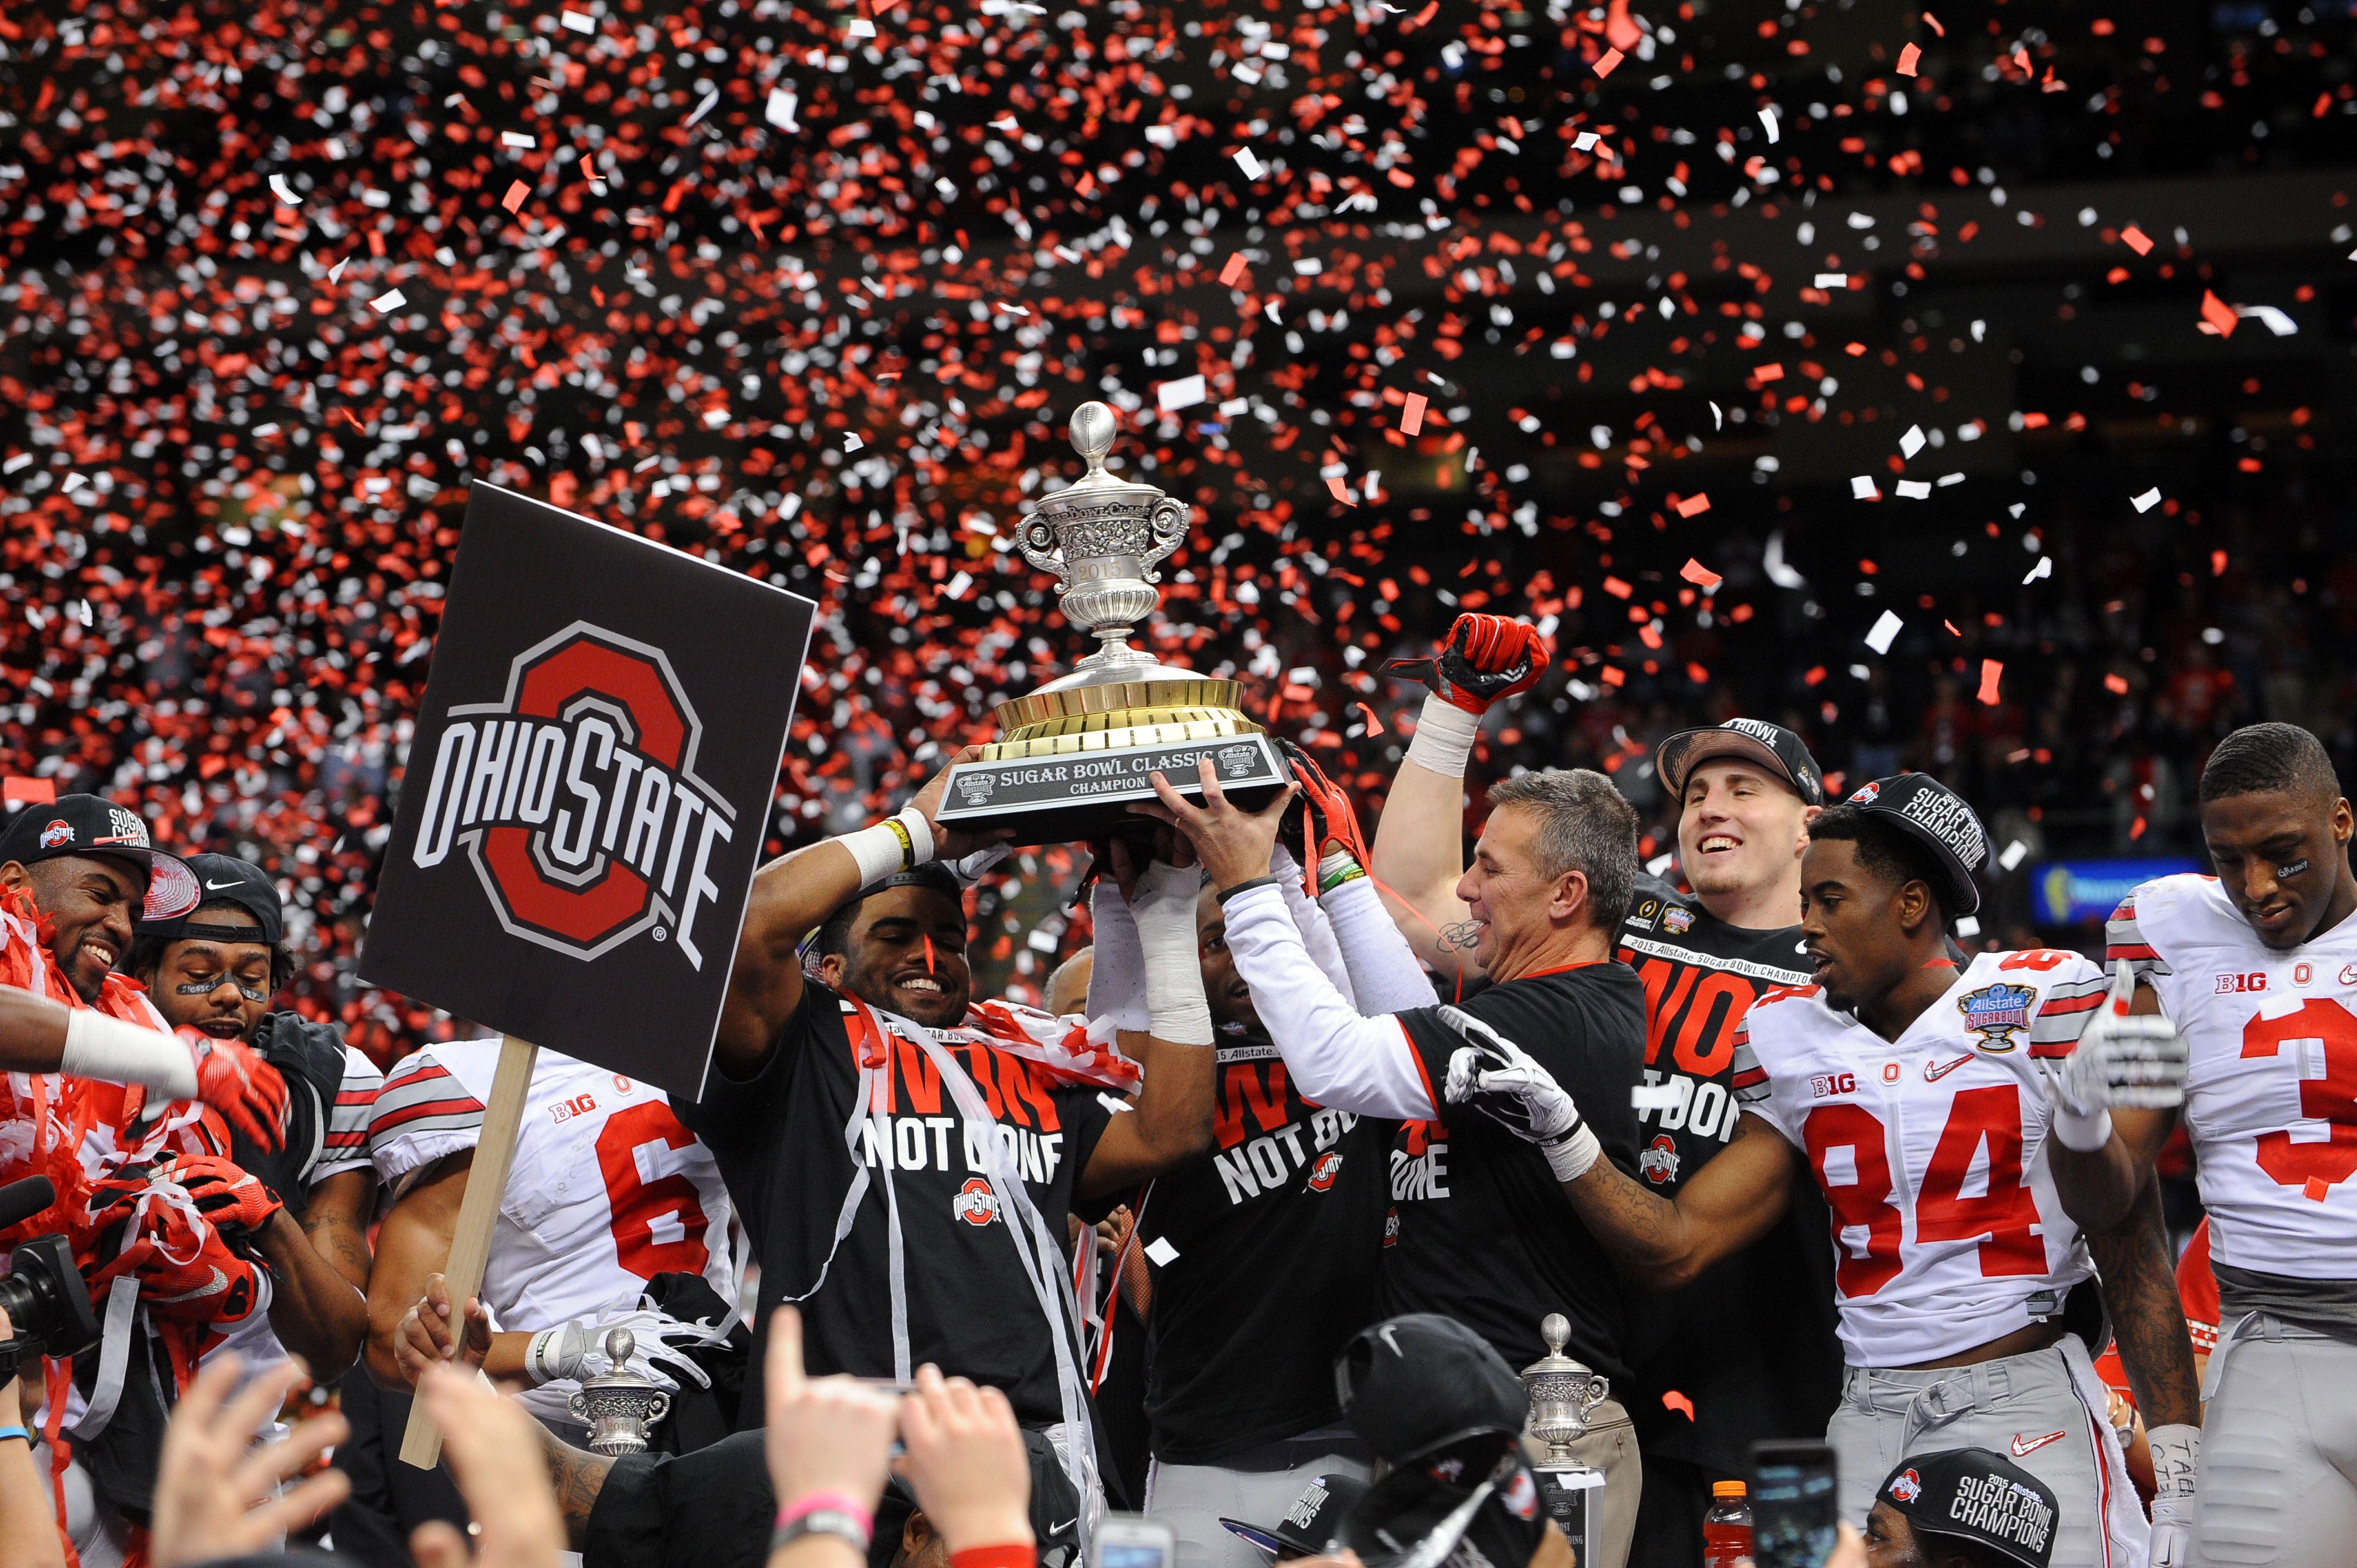 ohio state championship desktop wallpaper